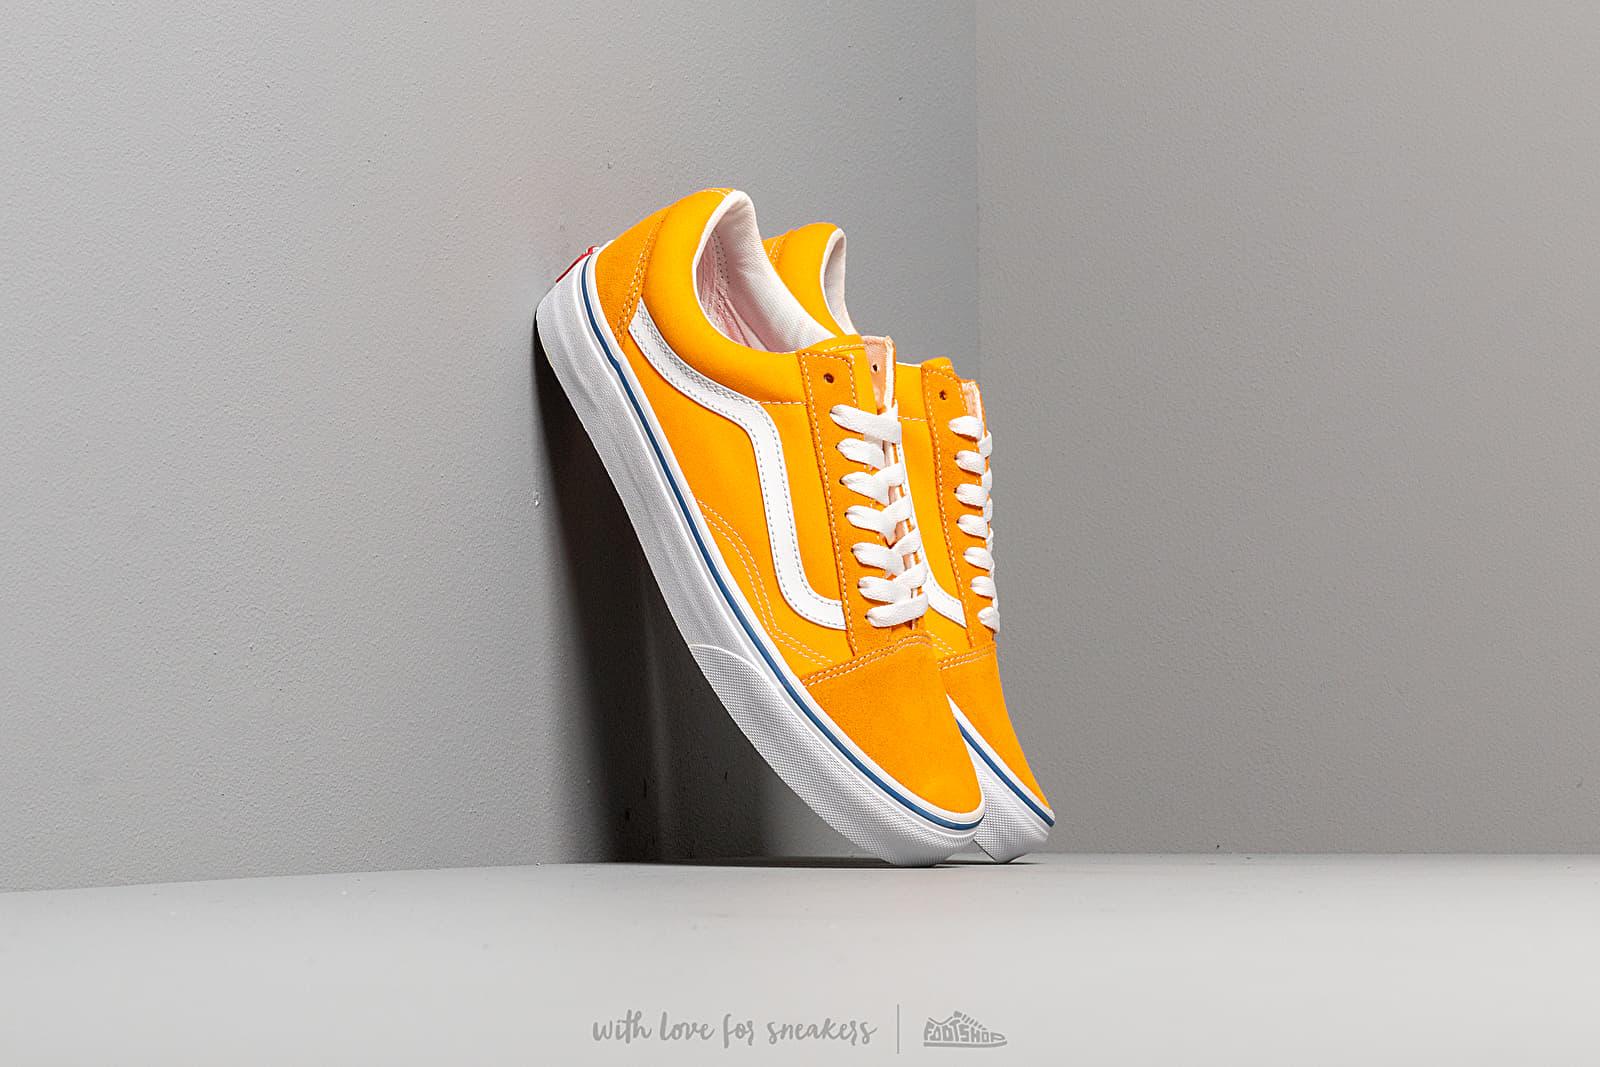 Pánské tenisky a boty Vans Old Skool (Suede/ Canvas) Zinnia/ True White